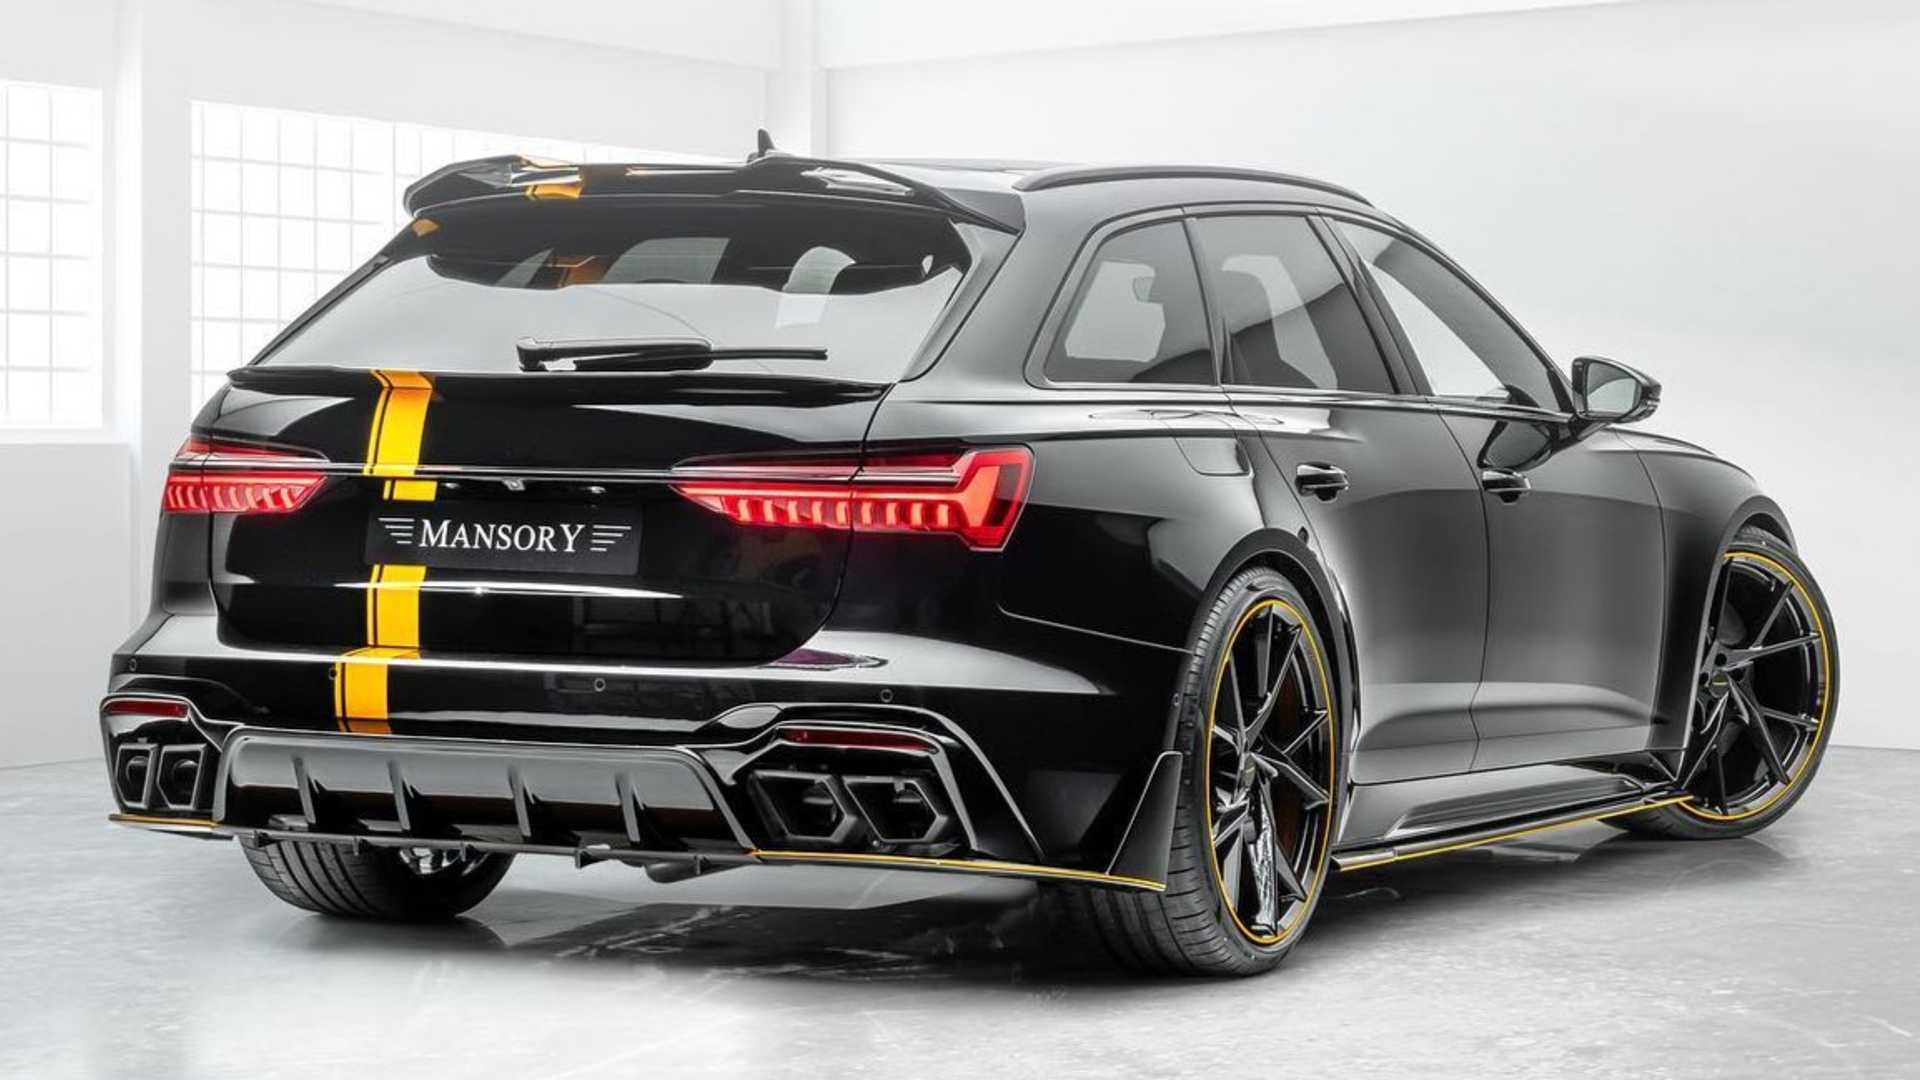 Audi RS6 Mansory